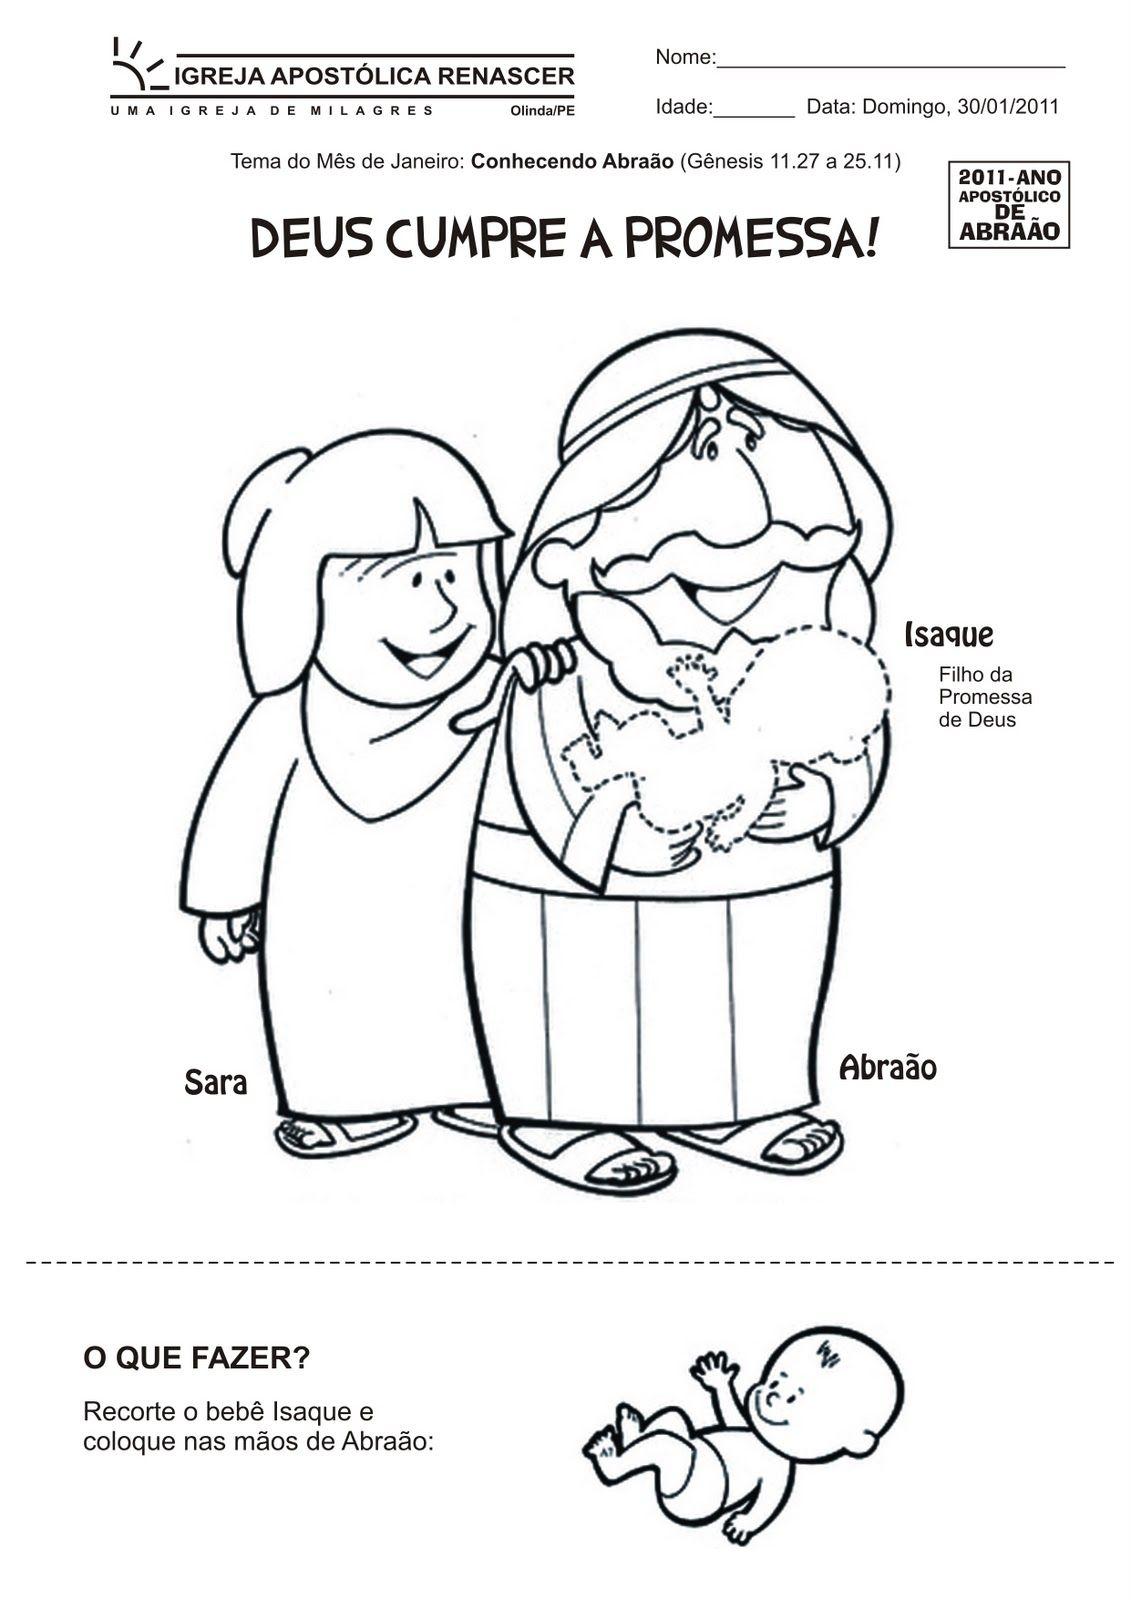 Abraao E A Promessa De Deus Desenhos E Atividades Agua Viva